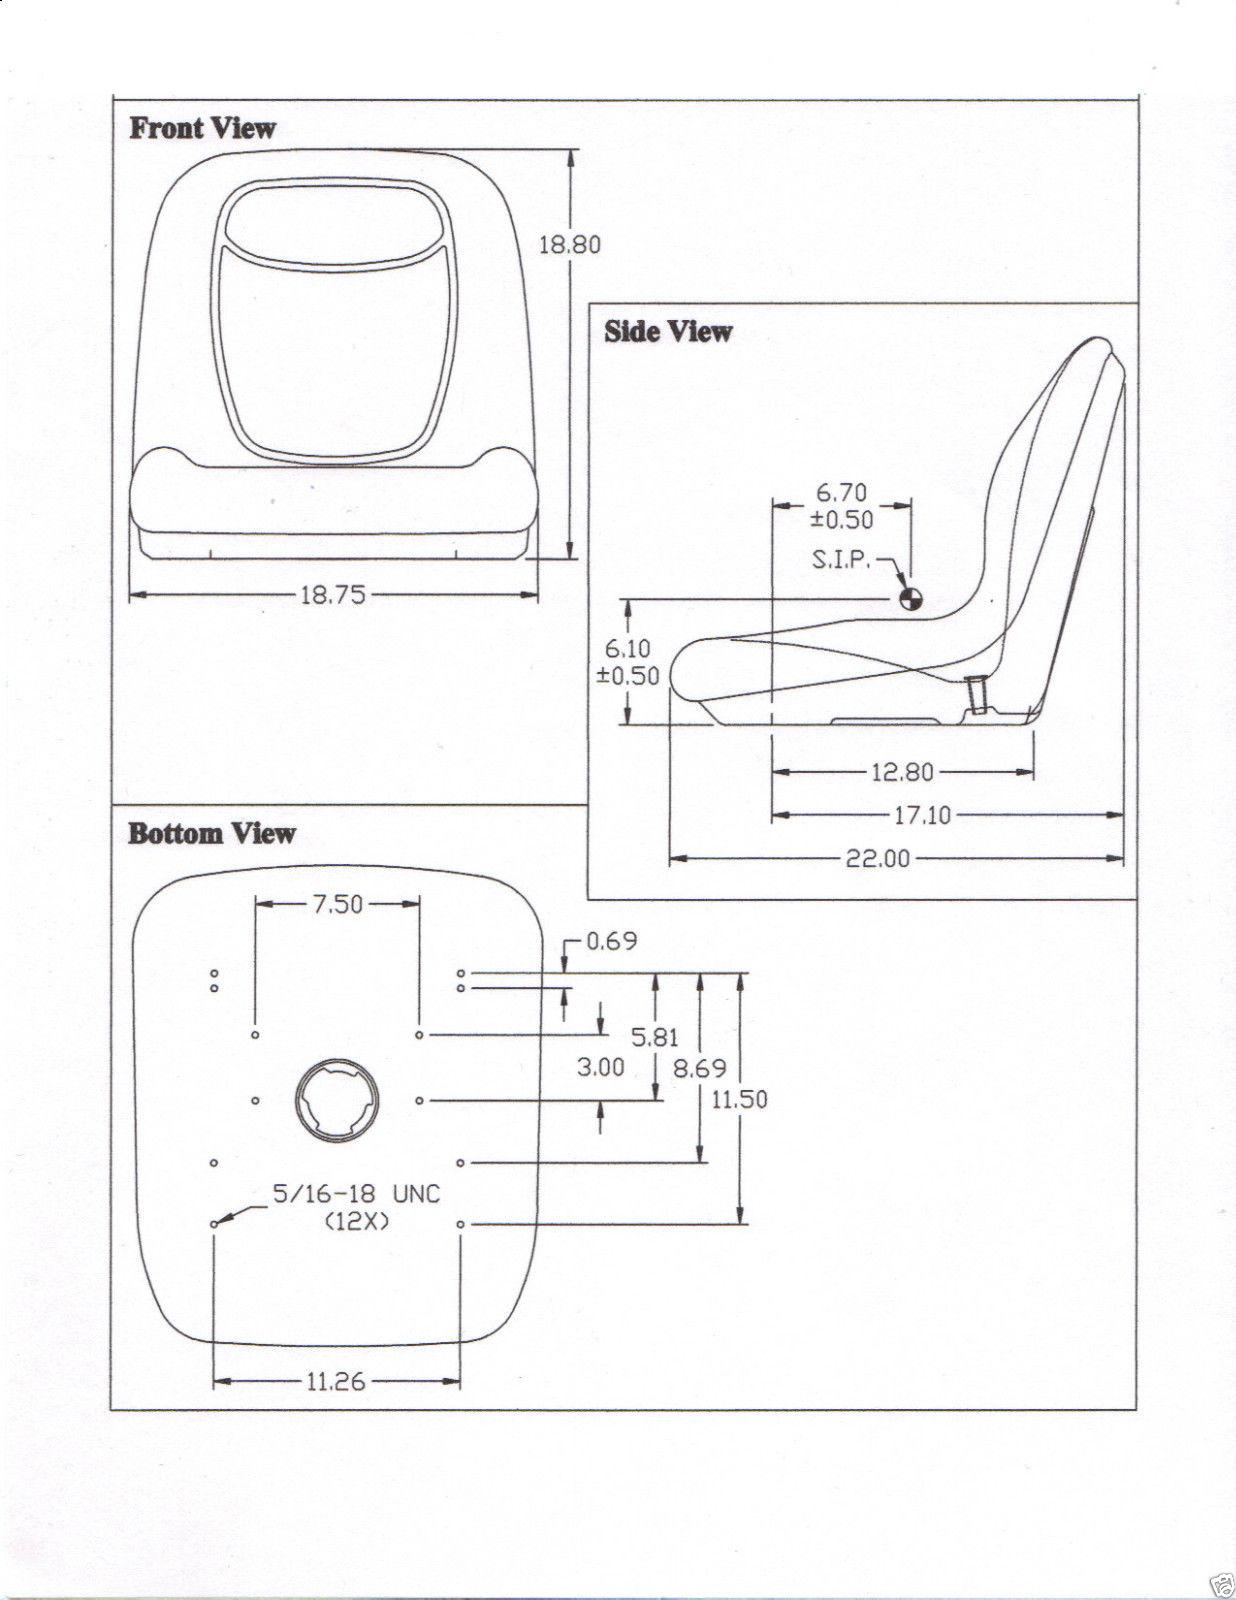 HIGH BACK YELLOW SEAT JOHN DEERE GATORS, HPX 4X4, HPX 4X2, 6X4, XUV 850D,  TX, TH #BI - Seat Warehouse